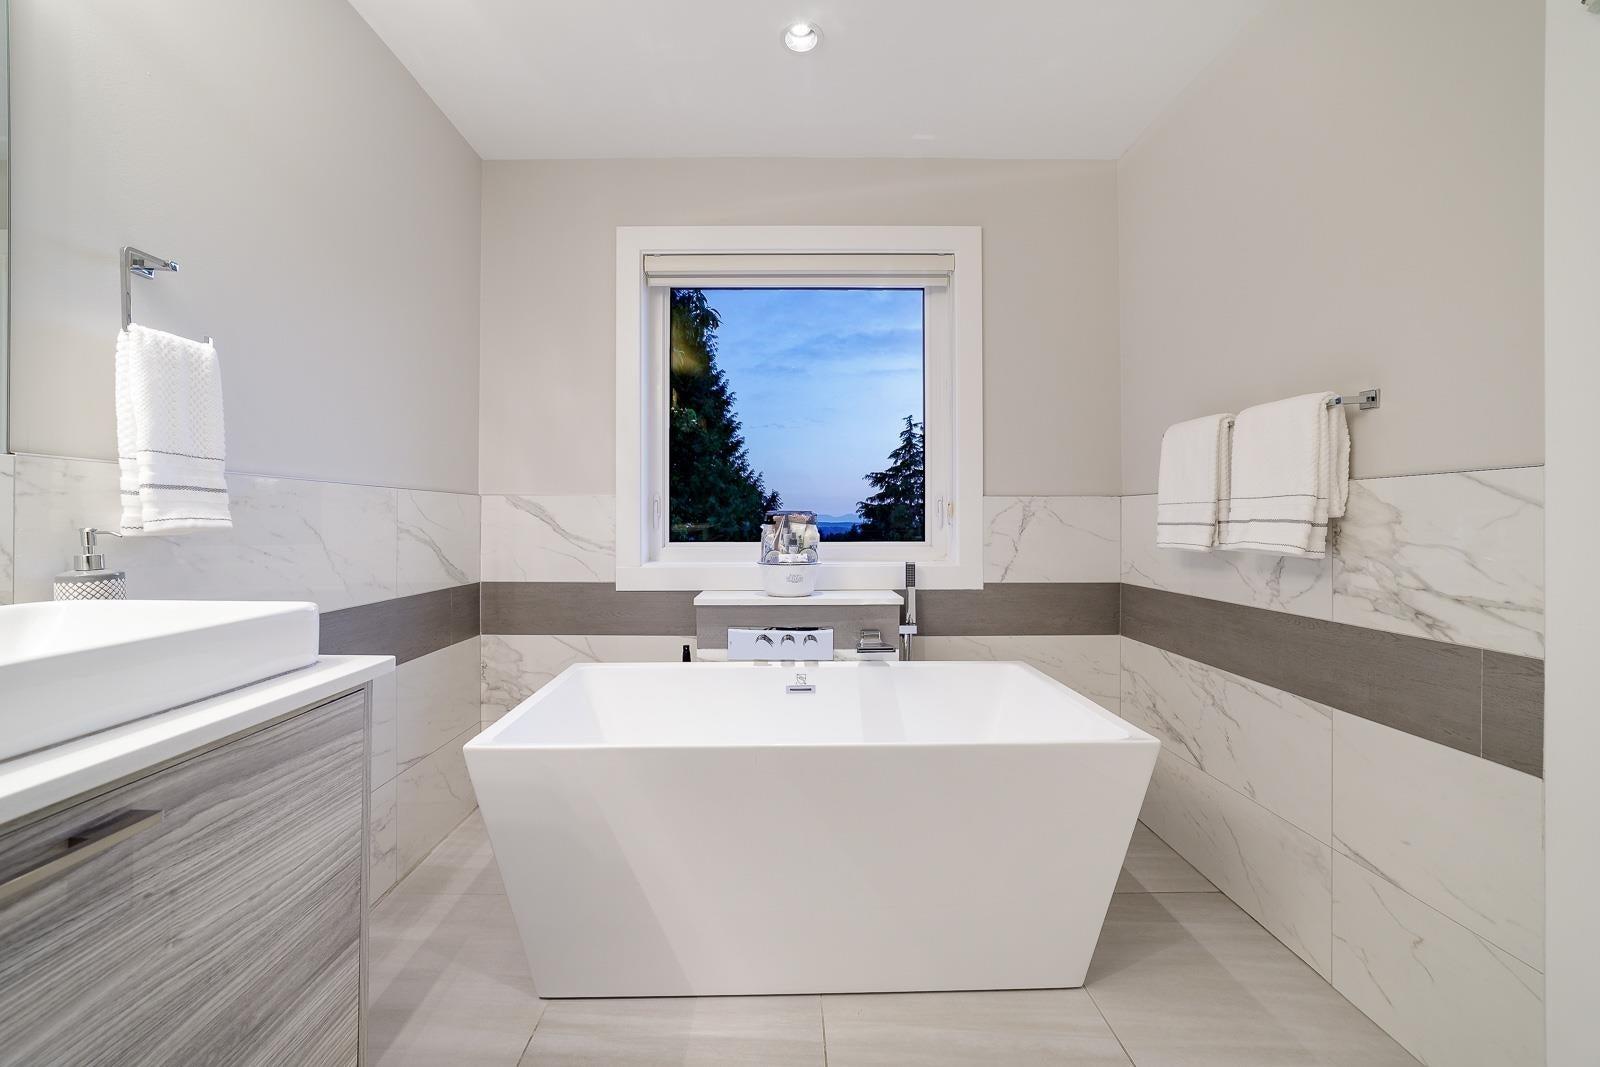 517 GRANADA CRESCENT - Upper Delbrook House/Single Family for sale, 8 Bedrooms (R2615057) - #18